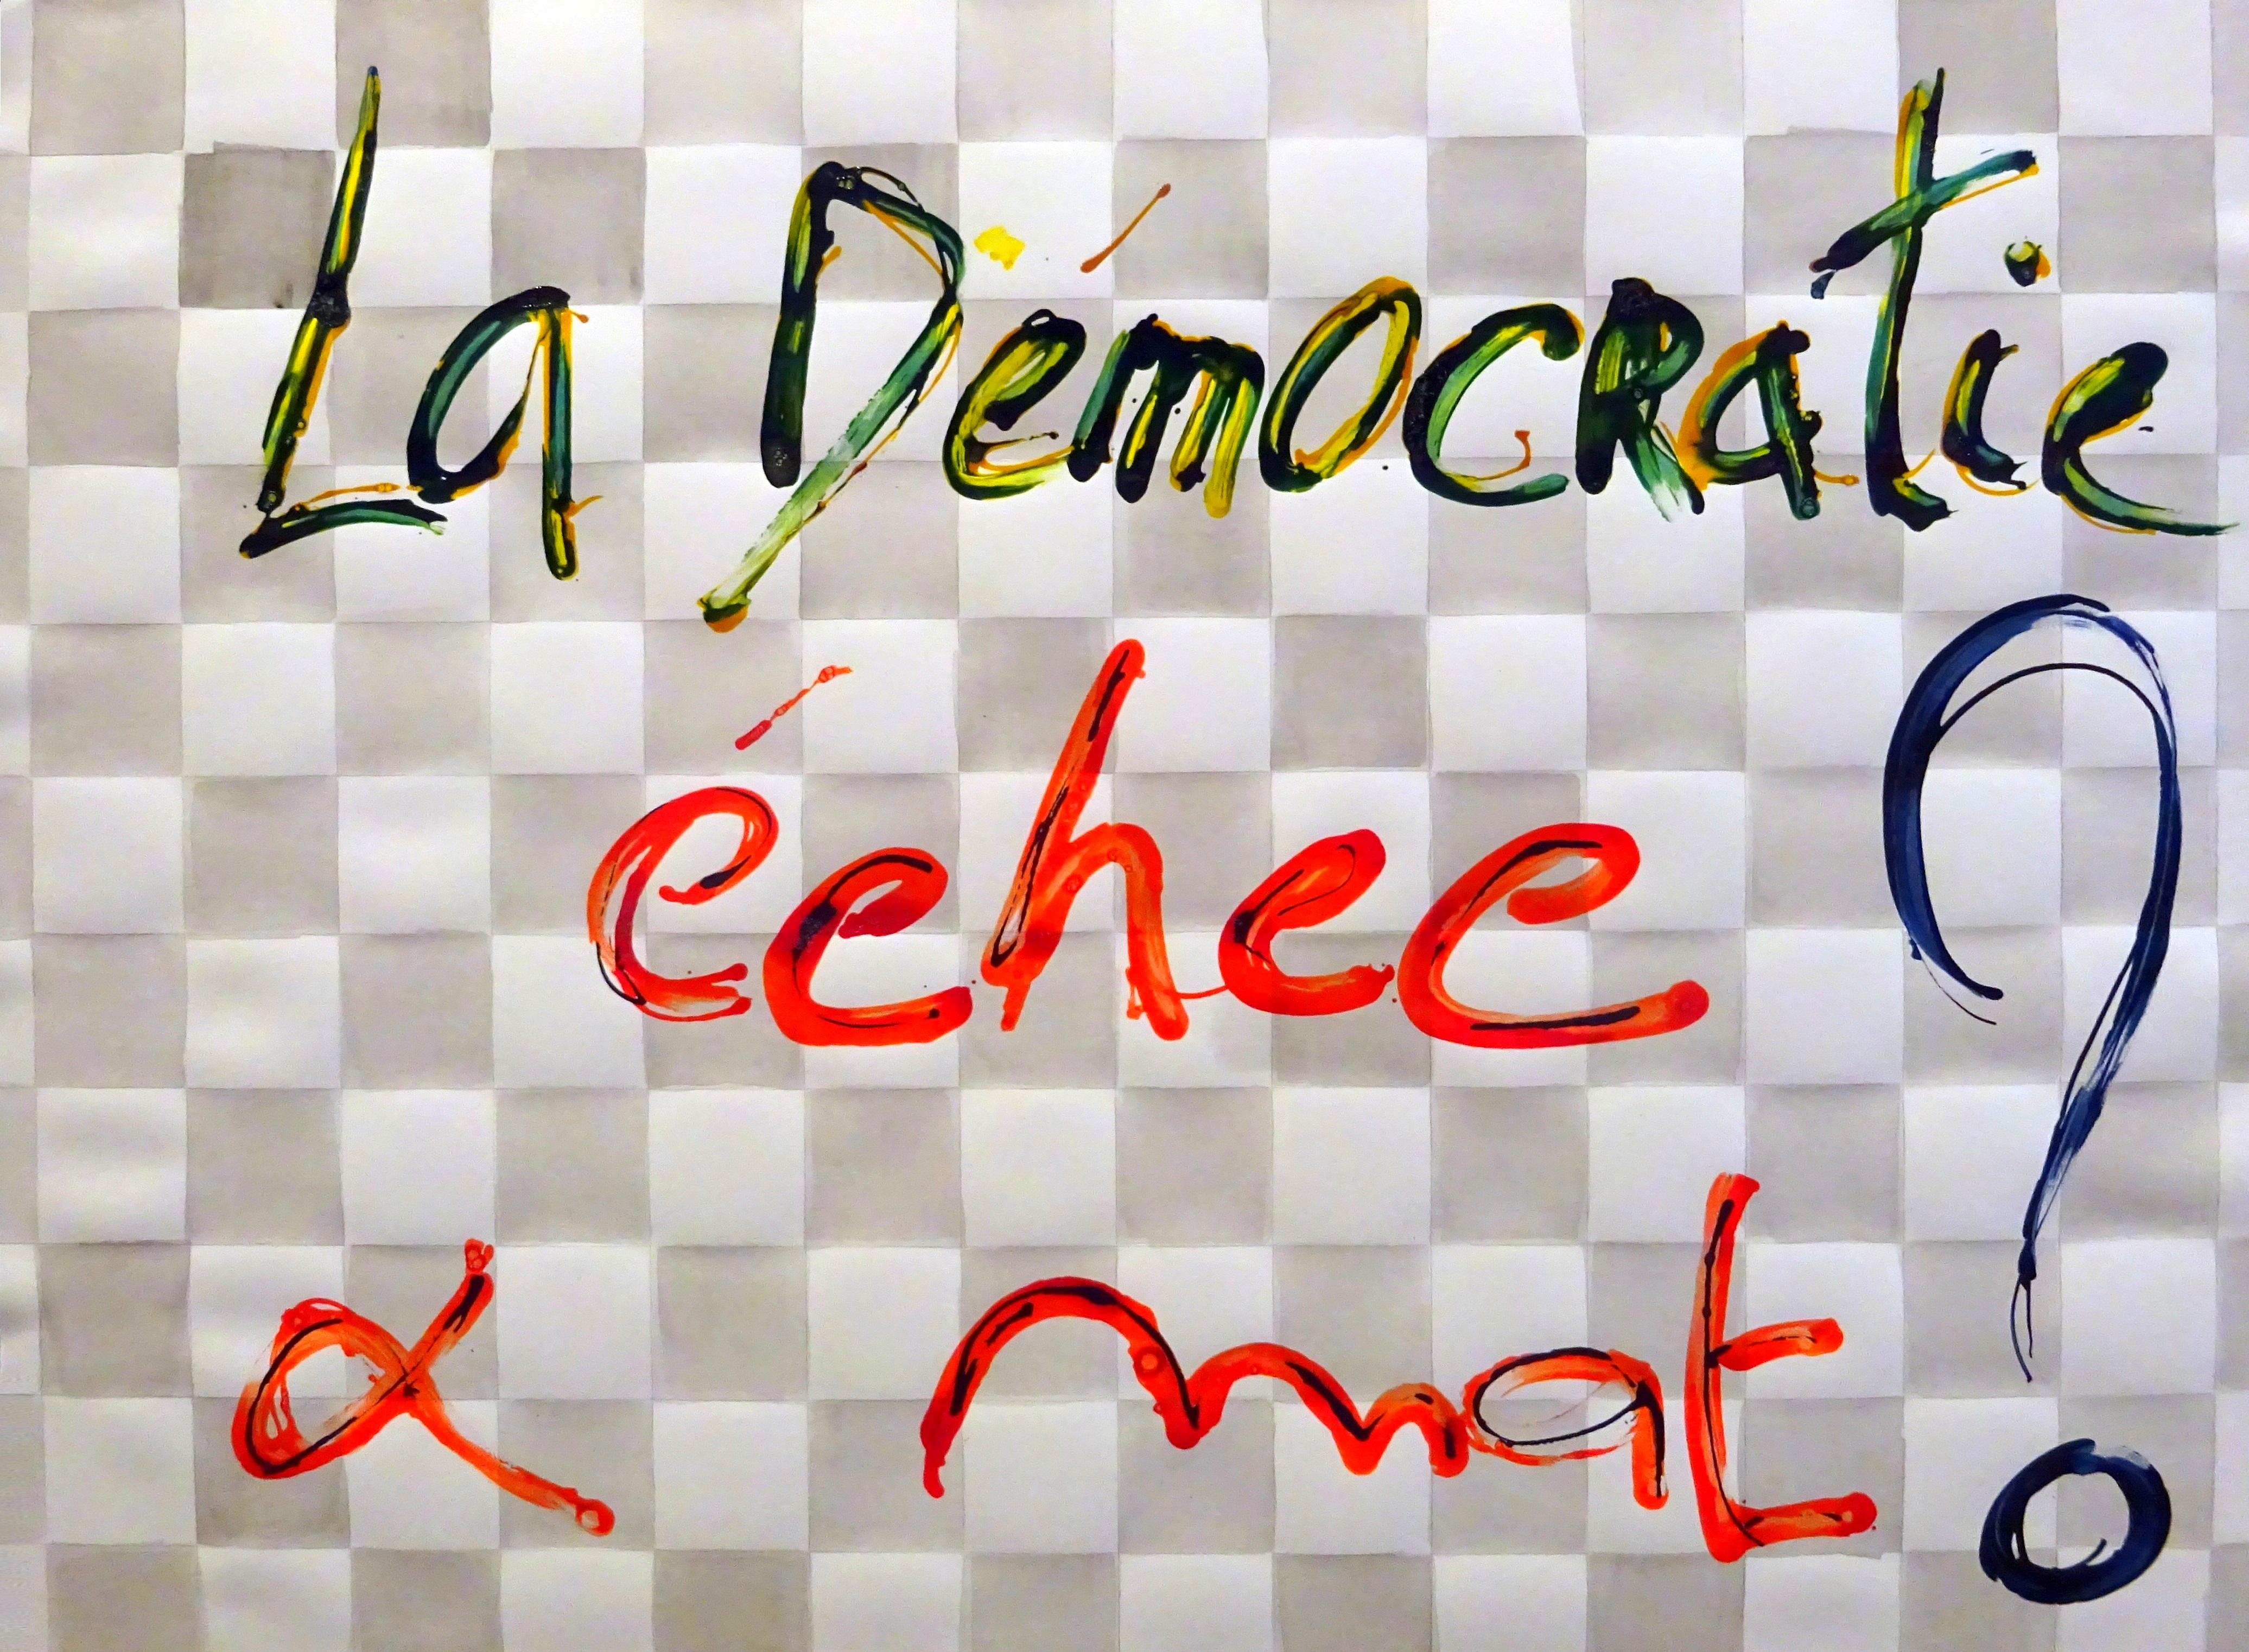 LA DEMOCRATIE ECHEC&MA